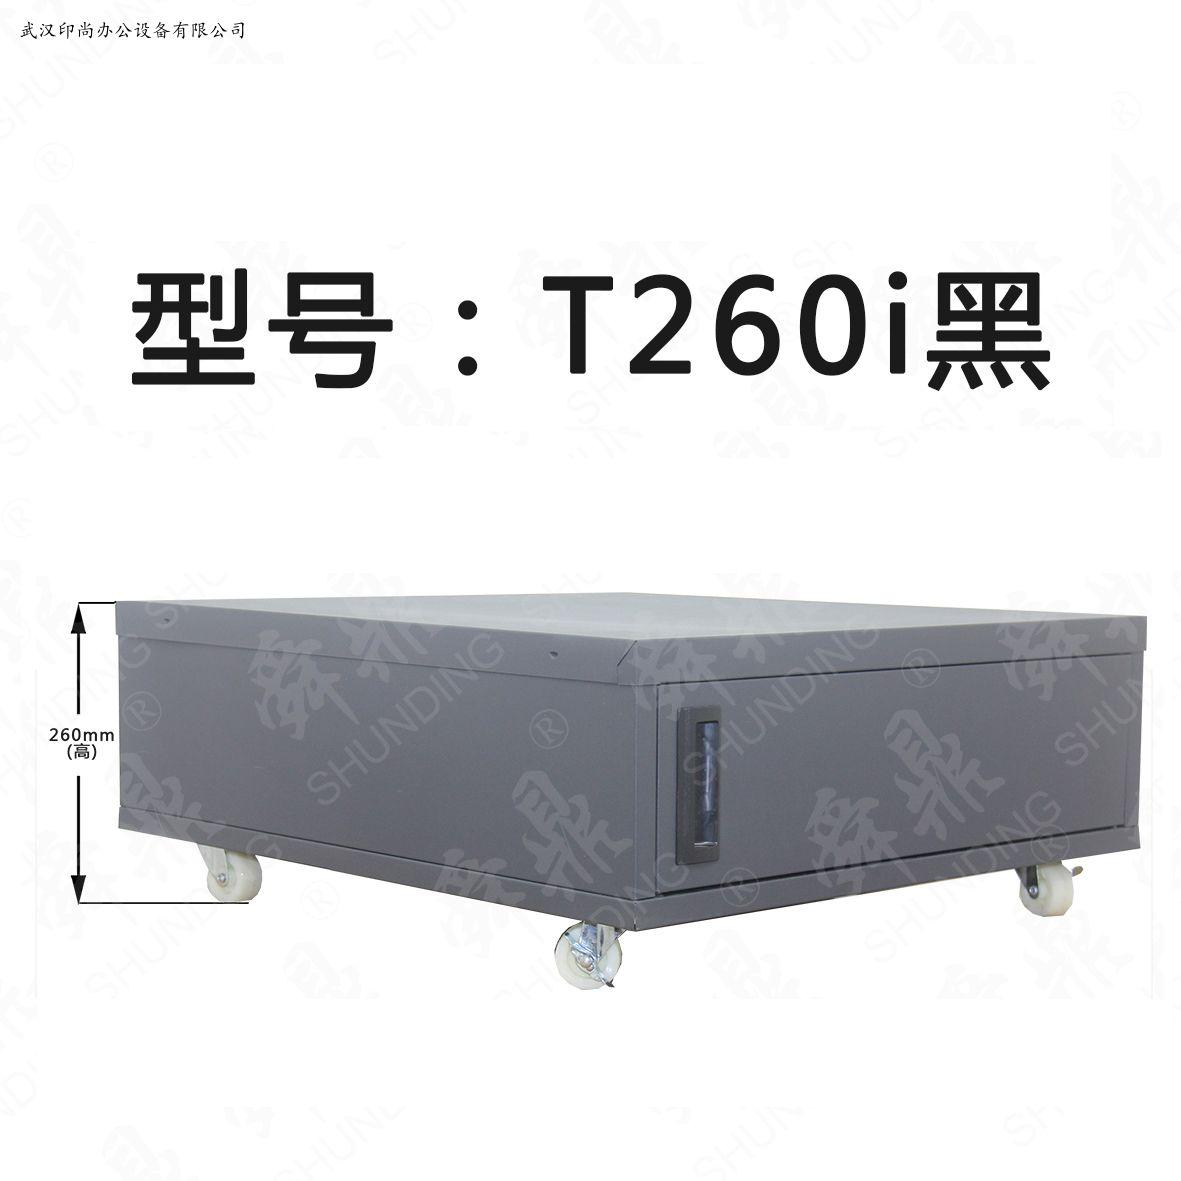 T260i(黑)(BLACK)